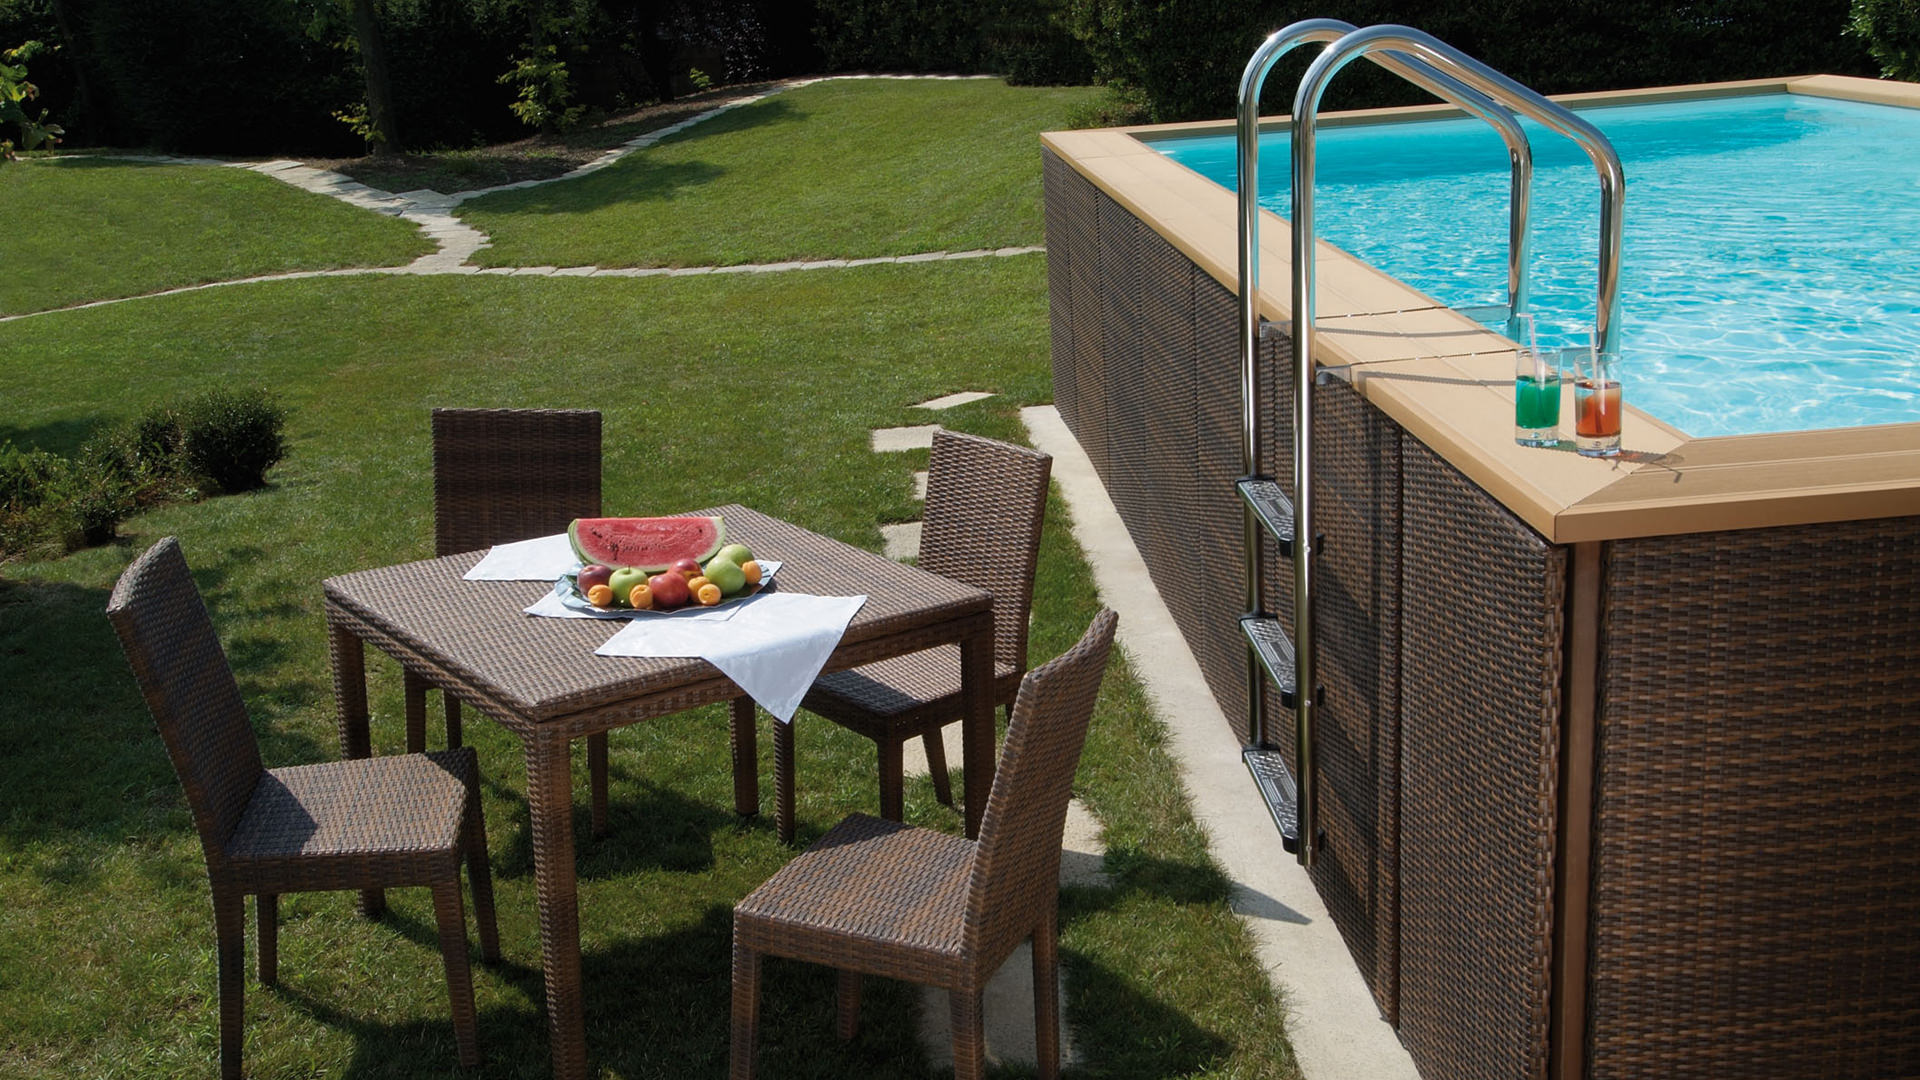 Entretien piscine hors sol pompe filtration piscine intex for Cout piscine hors sol